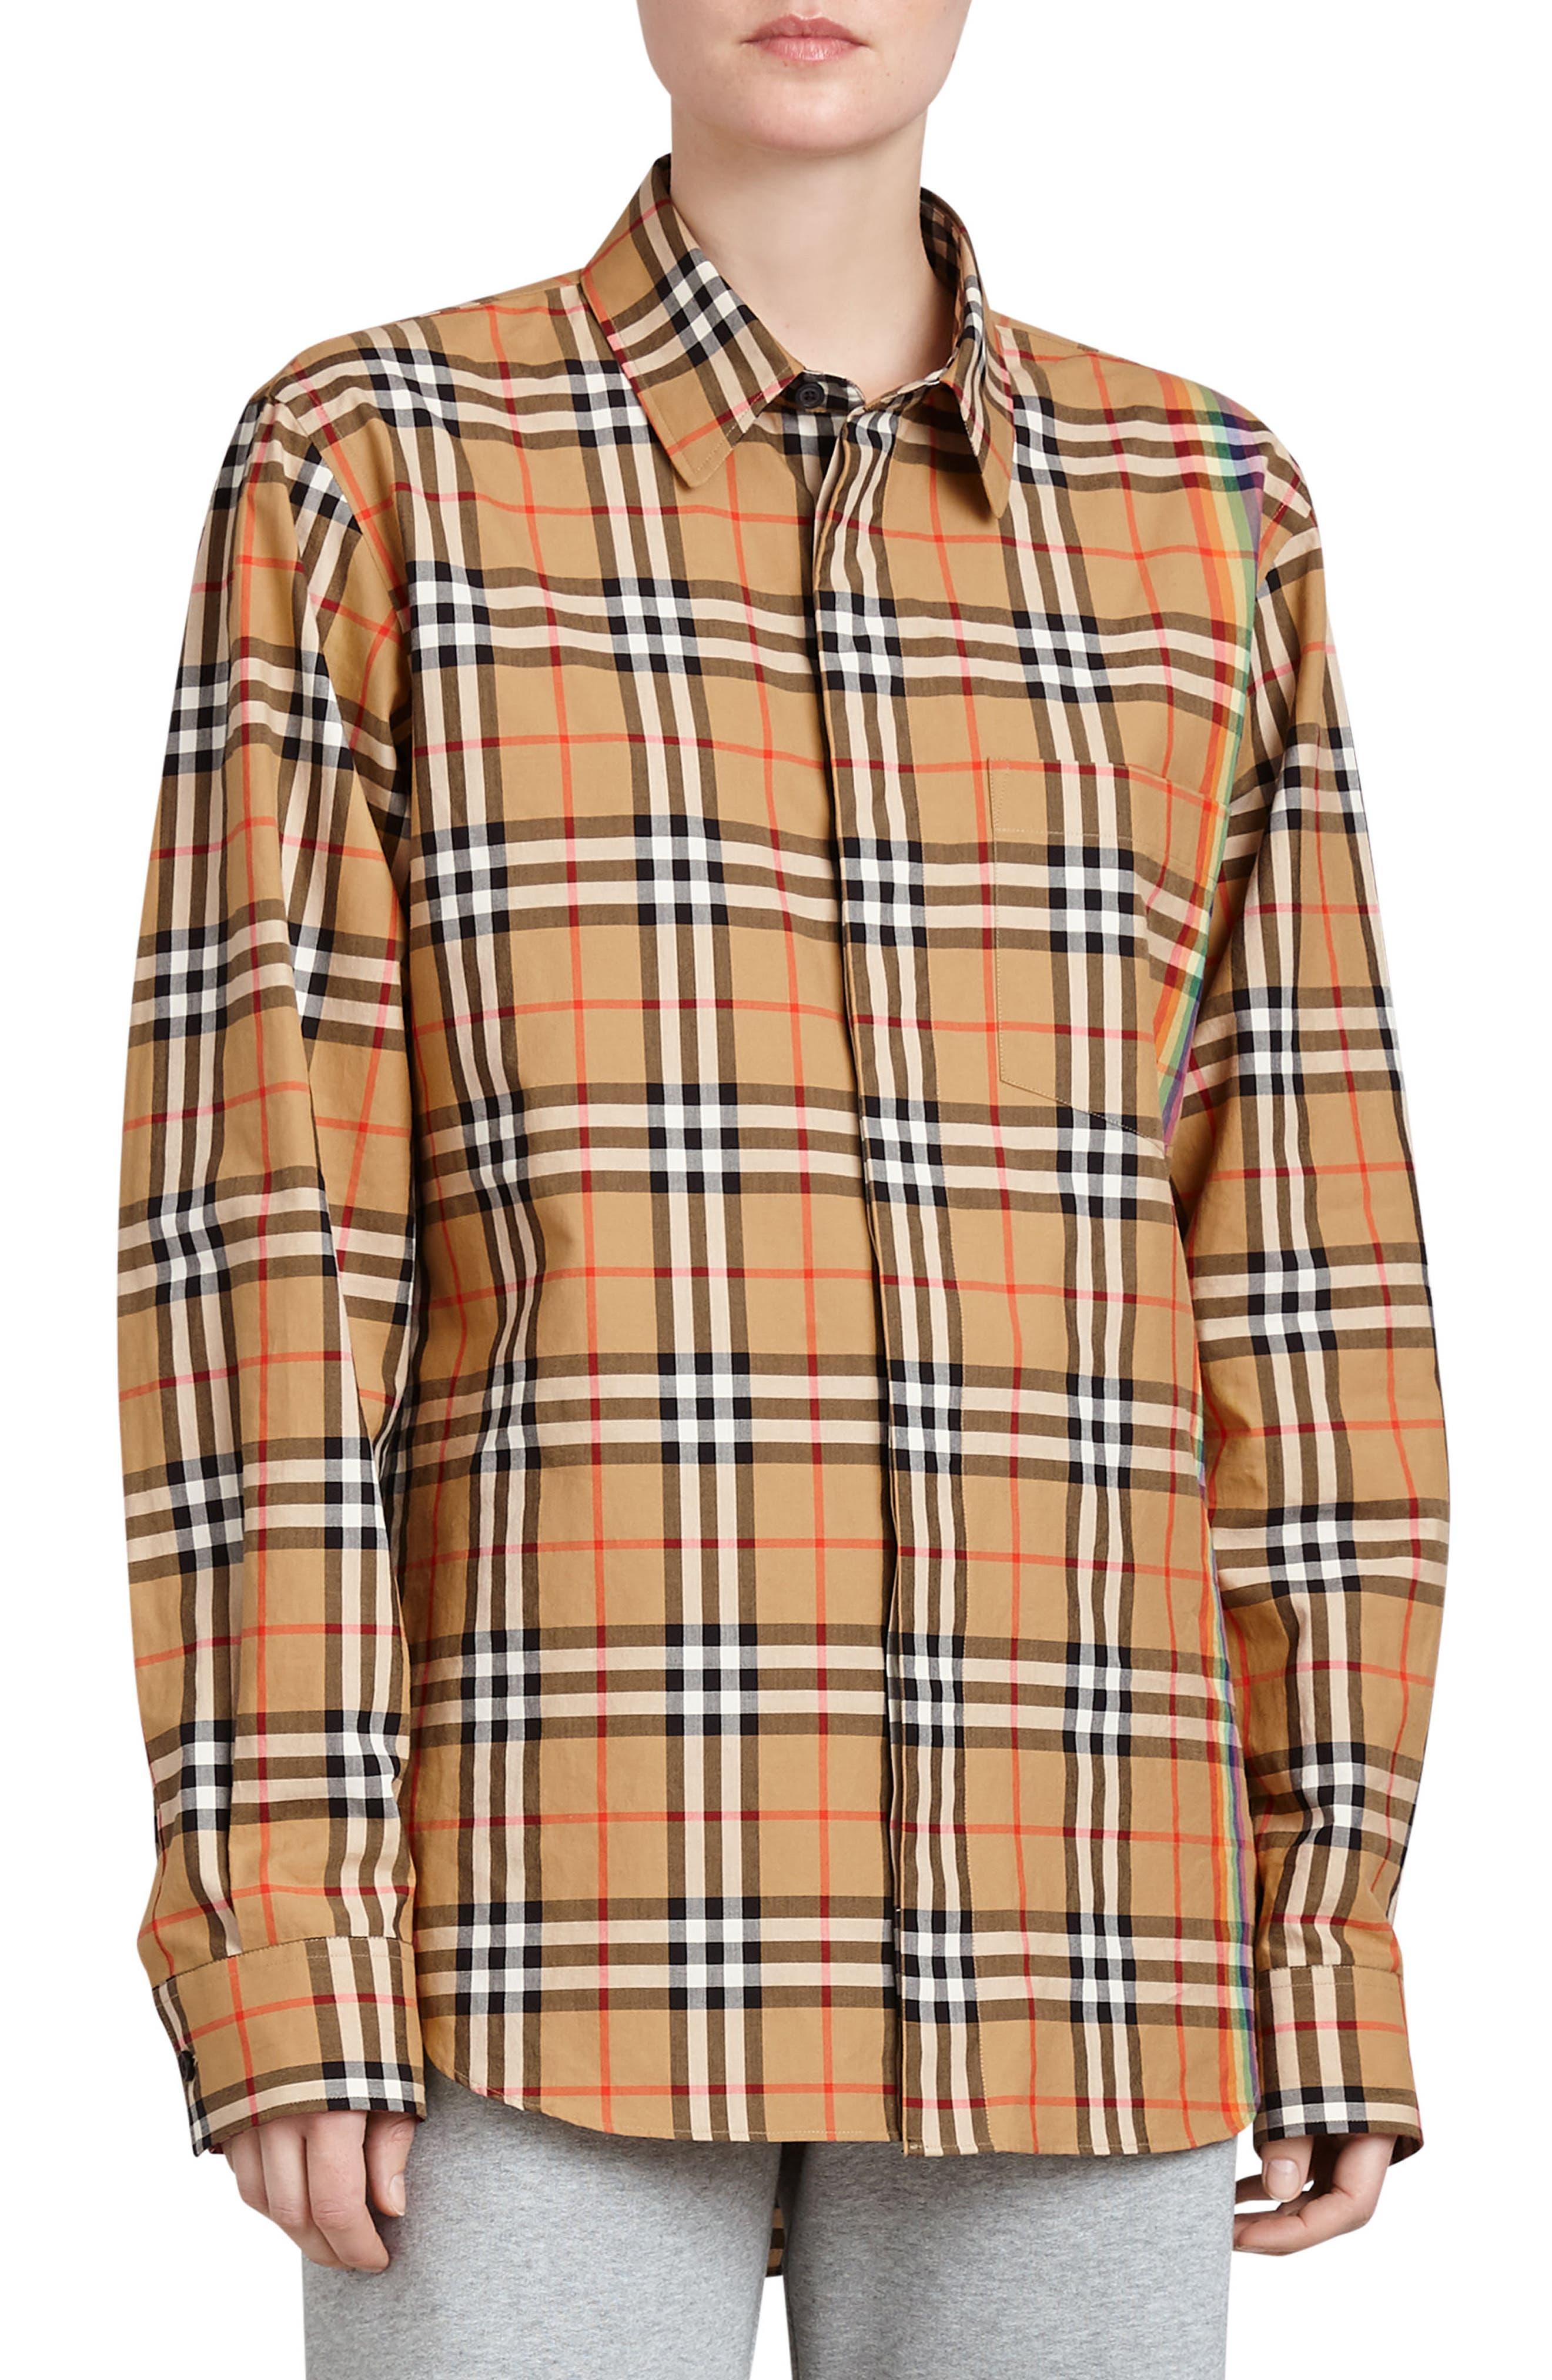 BURBERRY Rainbow Check Shirt, Main, color, 254